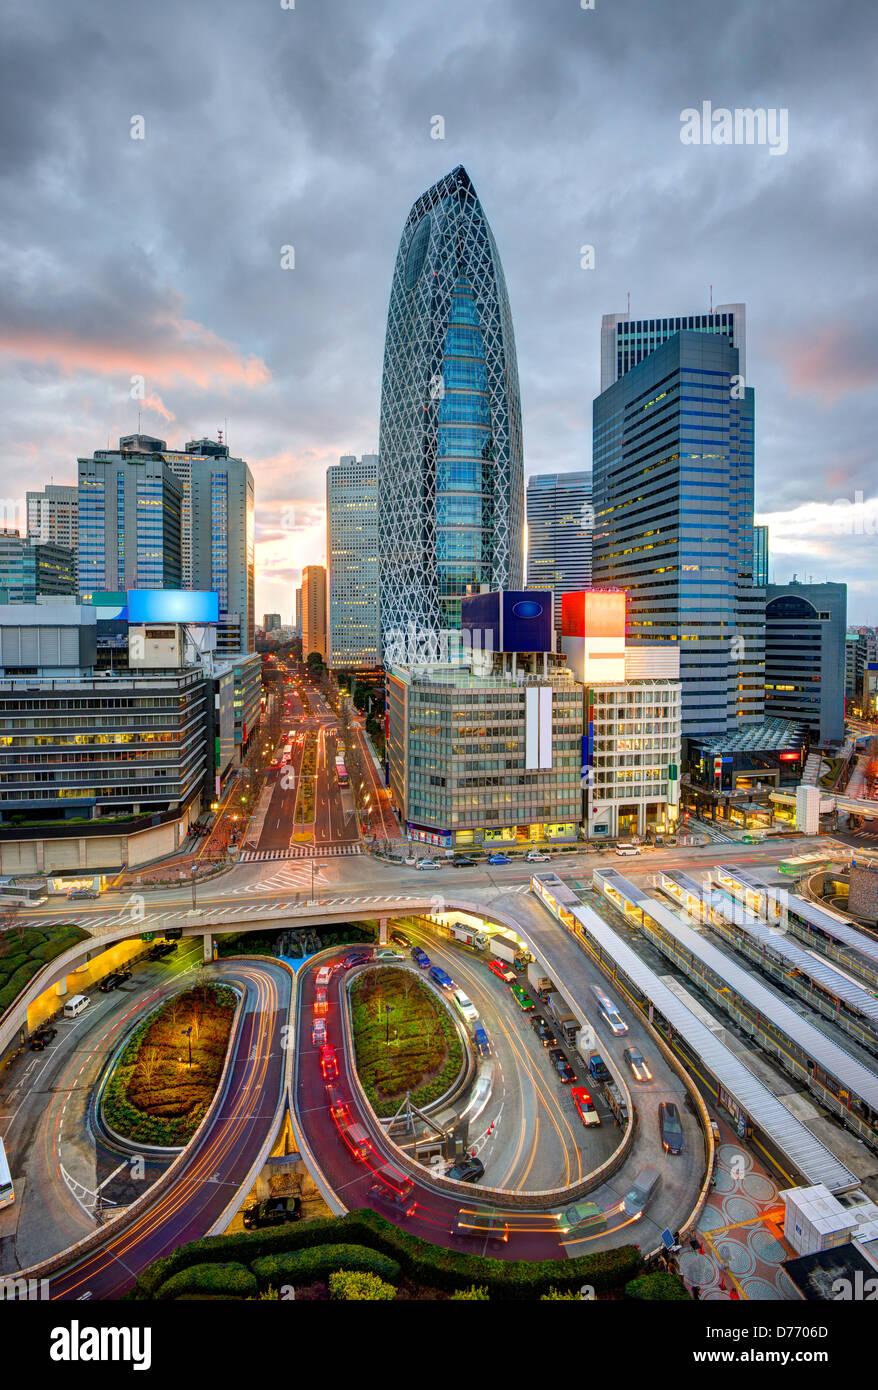 Shinjuku district cityscape of Tokyo, Japan - Stock Image